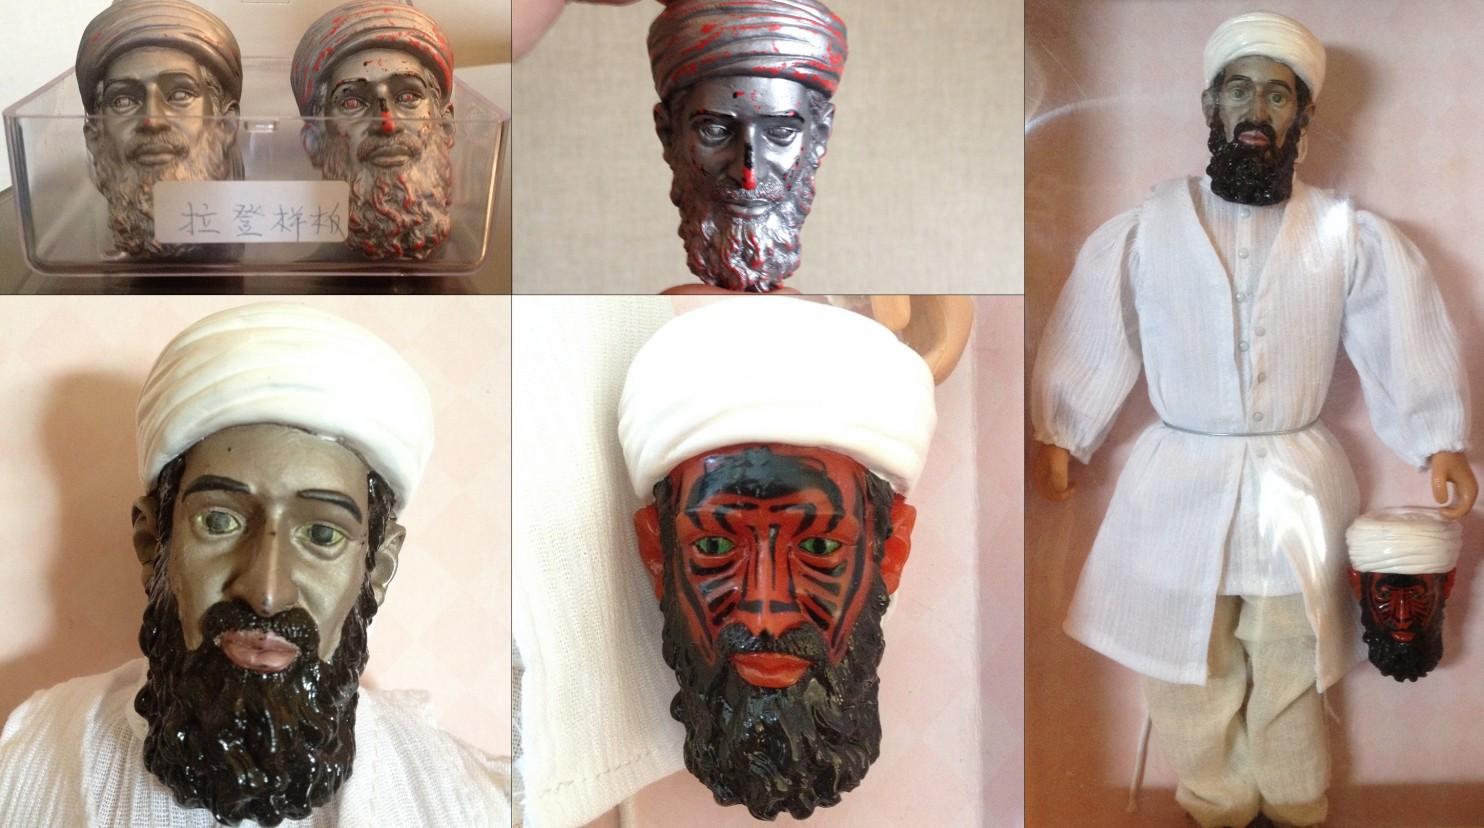 CIA made scary Bin Laden toy to counter al-Qaeda influence over children